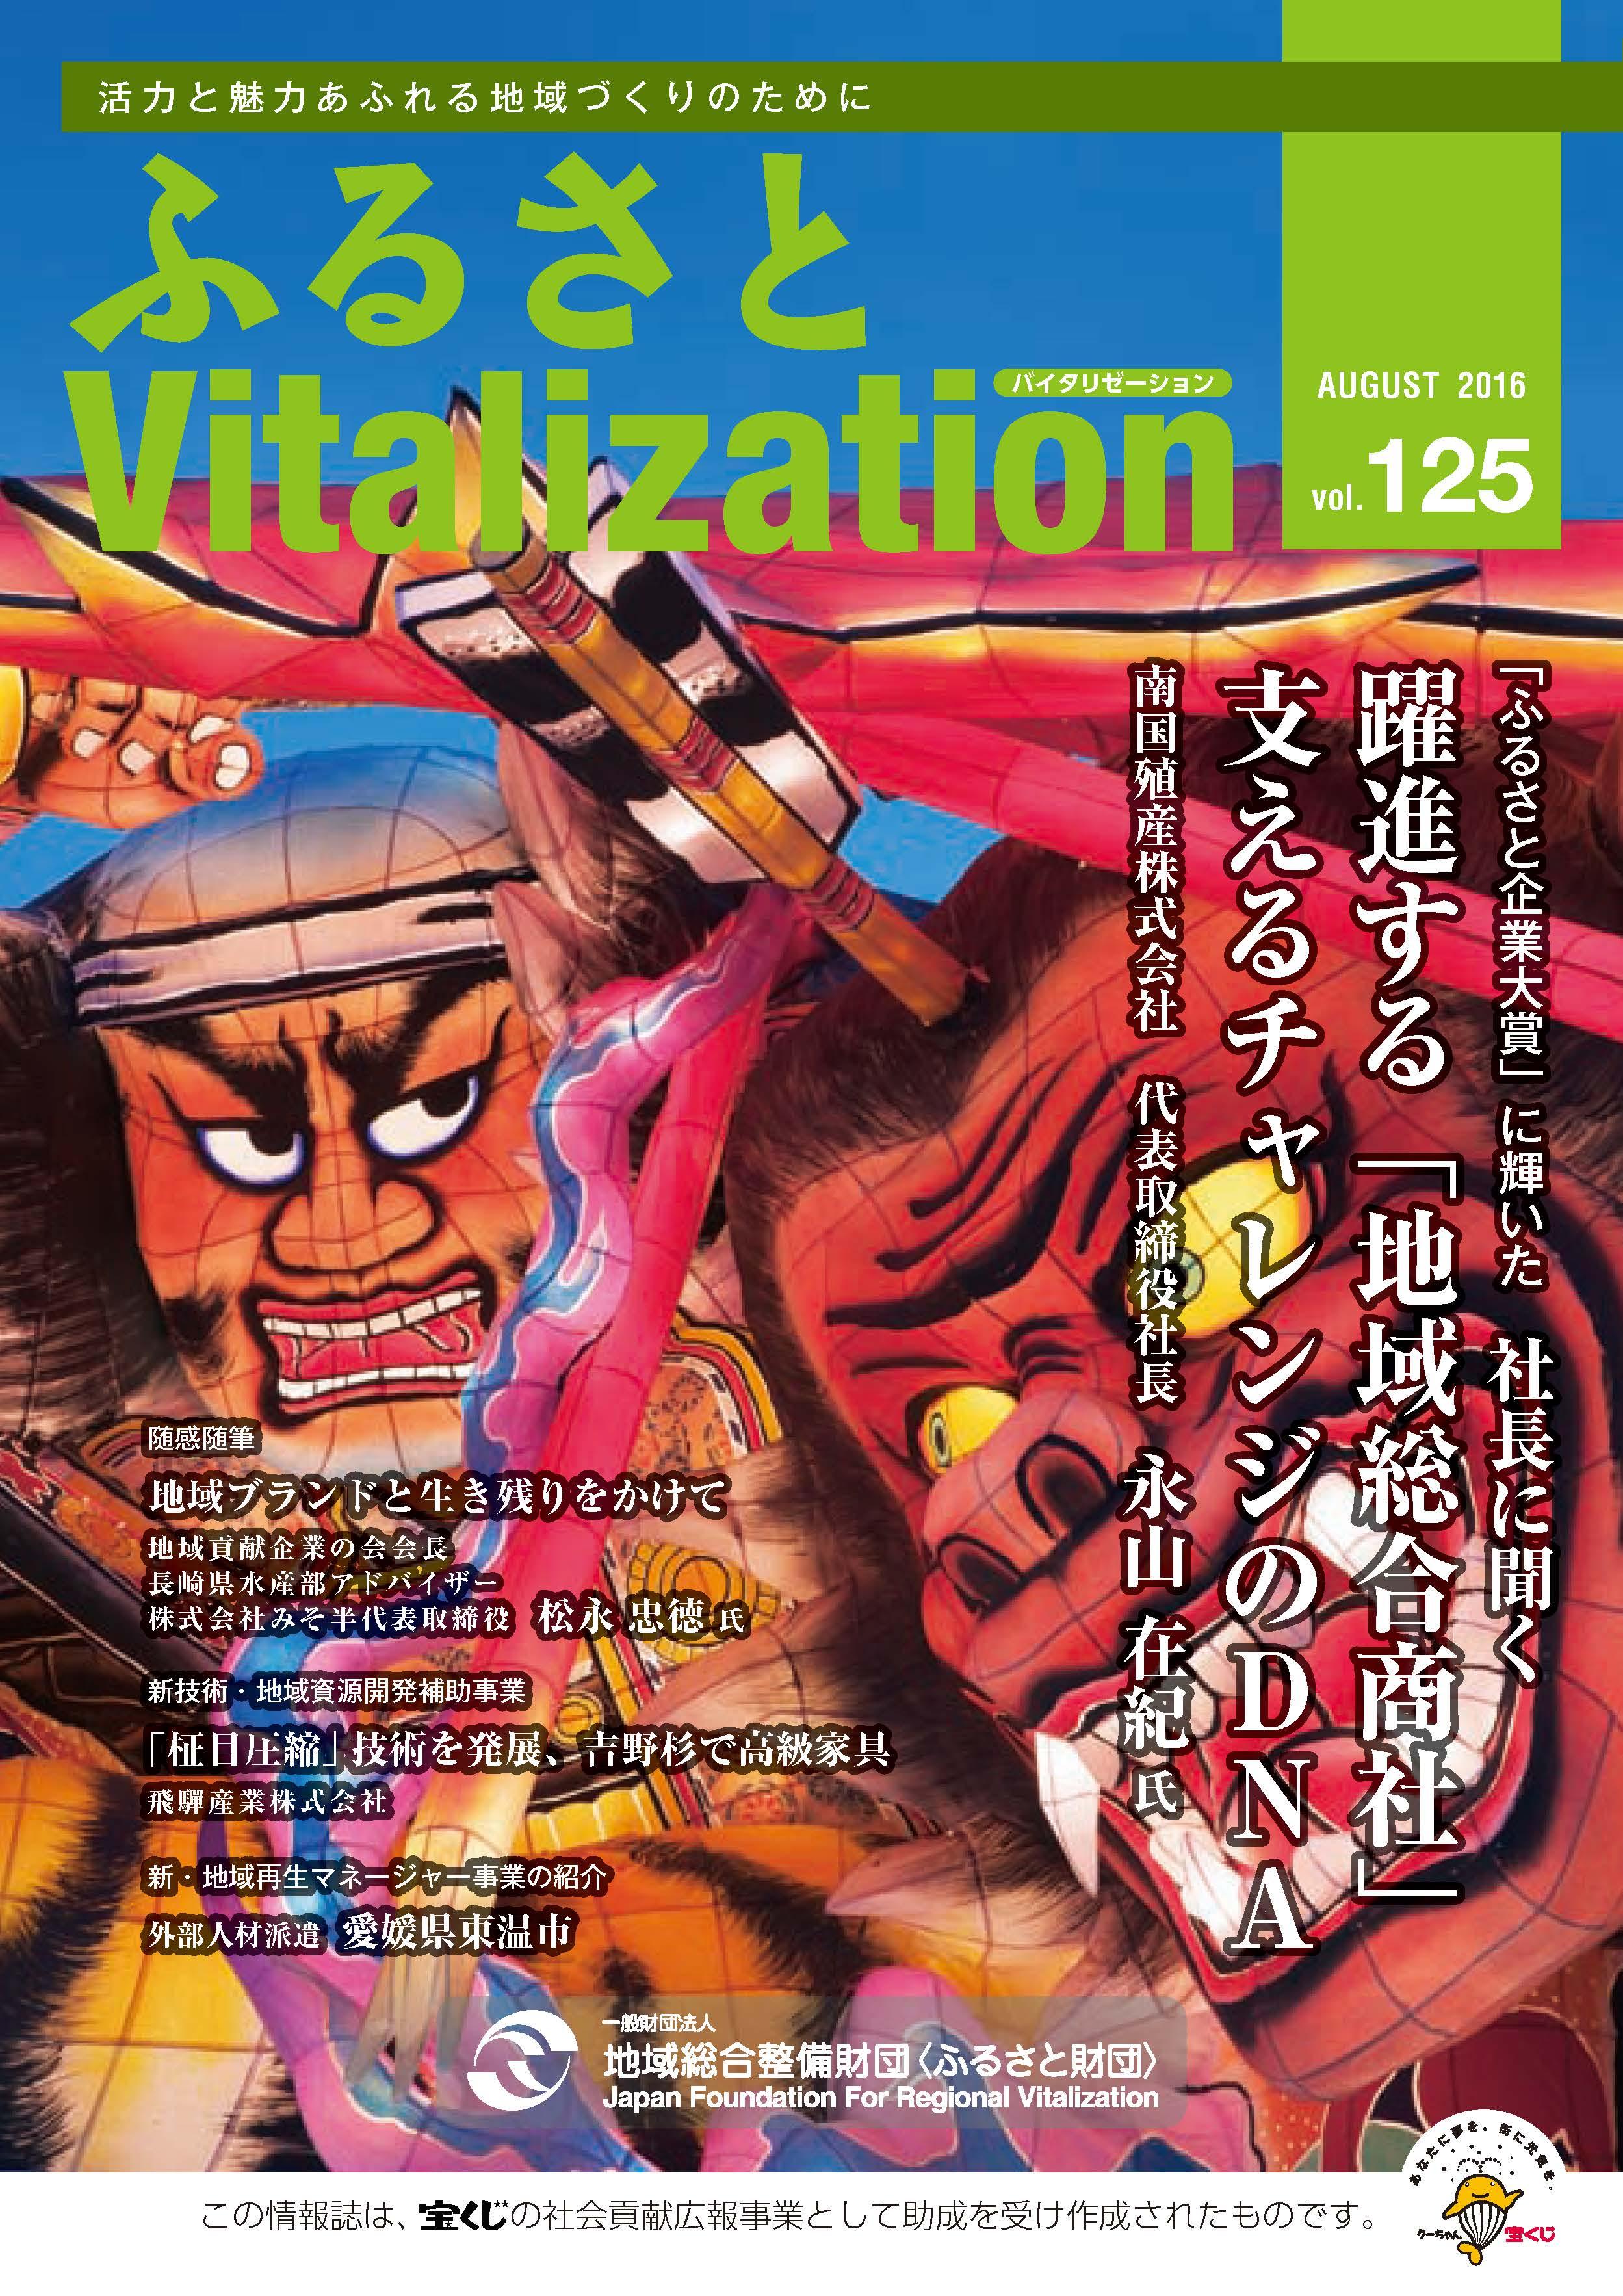 Furusato Vitalization vol.125-1.jpg